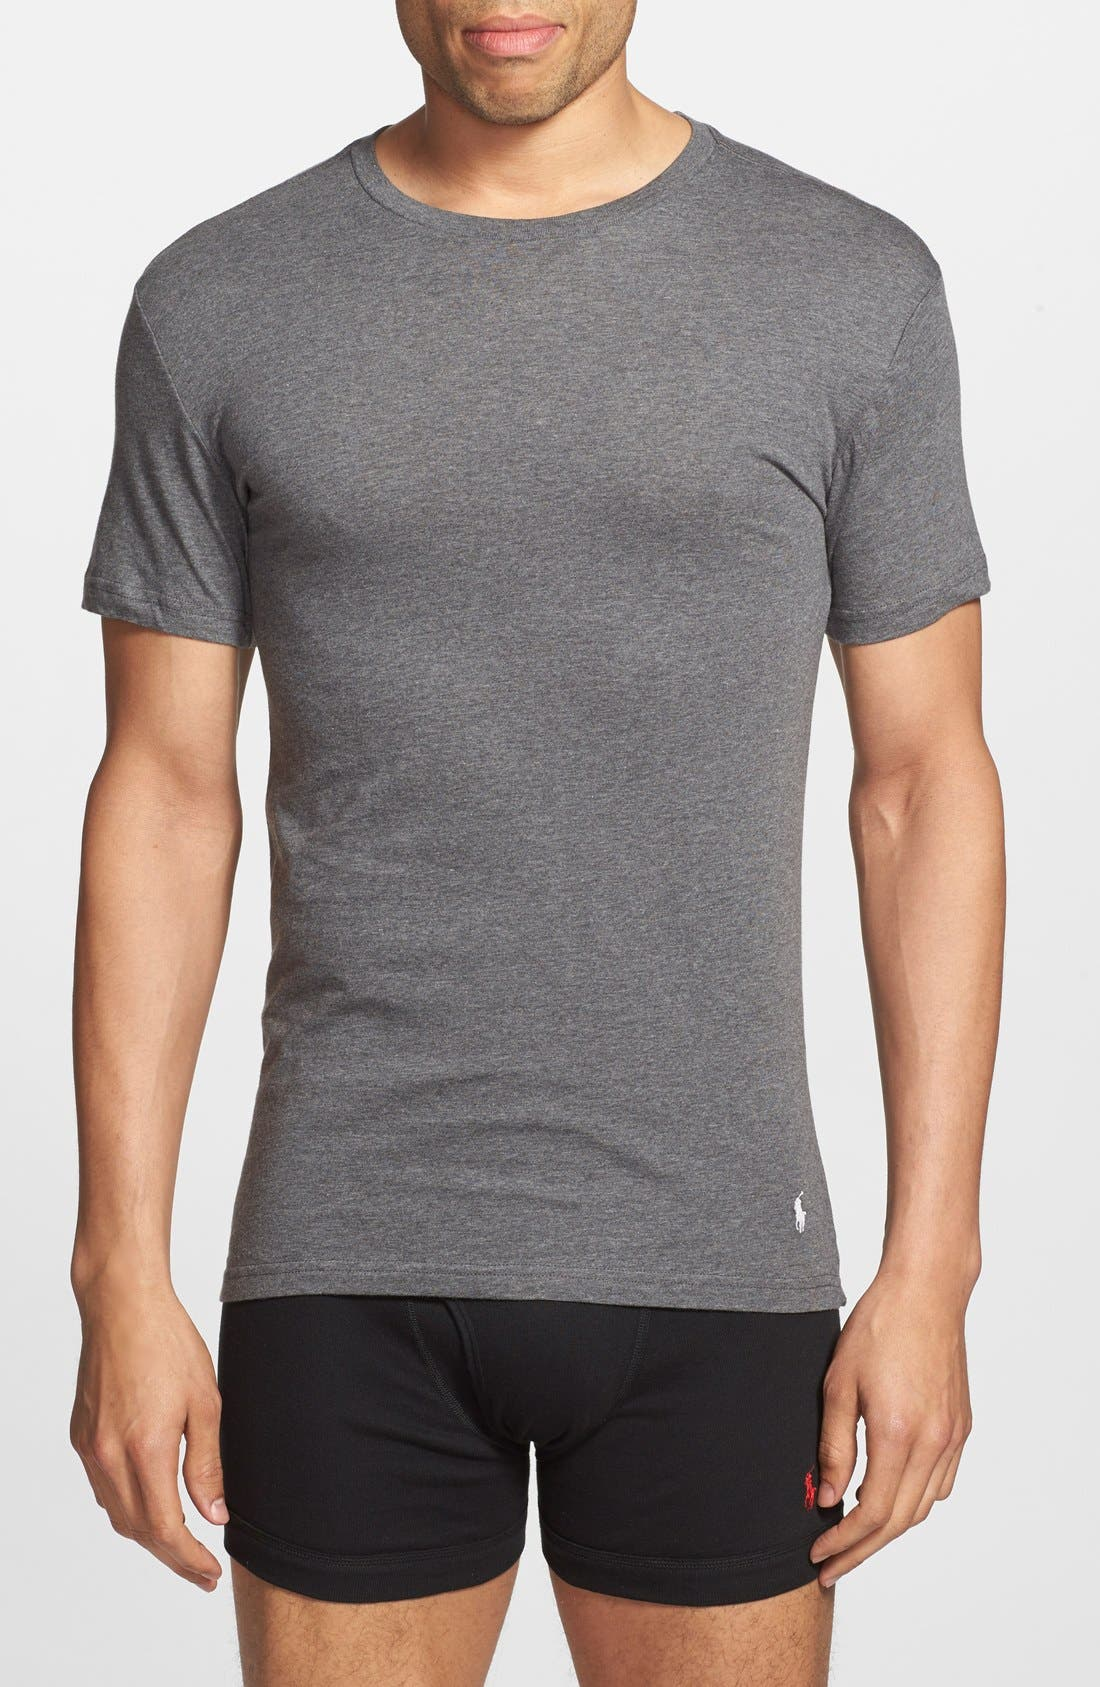 3-Pack Slim Fit T-Shirt,                             Main thumbnail 1, color,                             BLACK/ GREY/ CHARCOAL